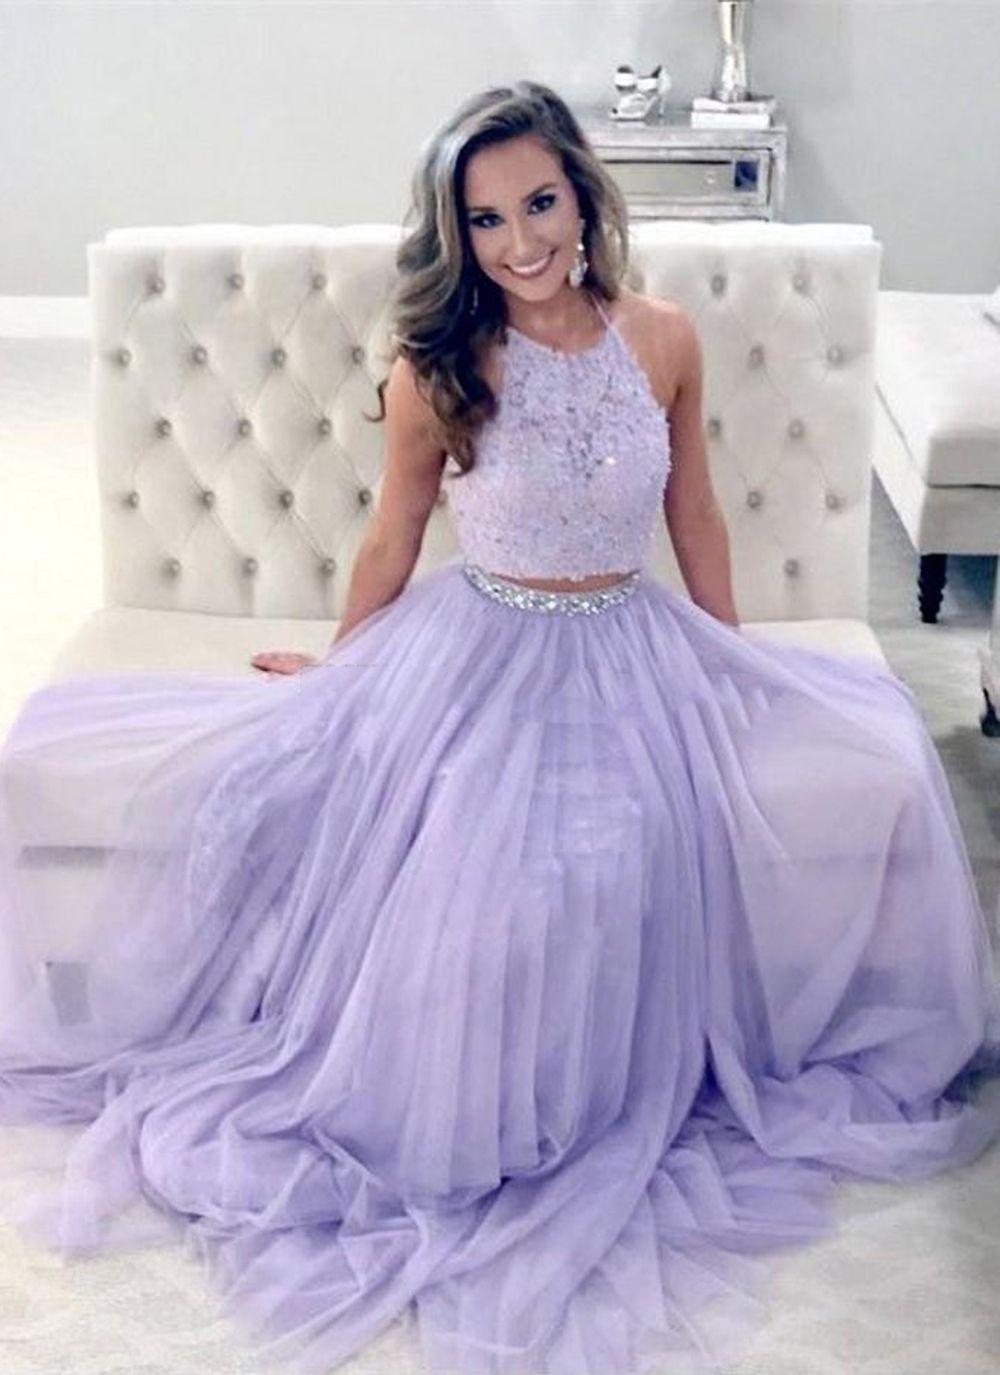 Sp1134 Elegant Prom Dresses Lavender Prom Dress Two Piece Prom Dresses Halter Prom Gown Lace Prom D Lavender Prom Dresses Elegant Prom Dresses Piece Prom Dress [ 1375 x 1000 Pixel ]